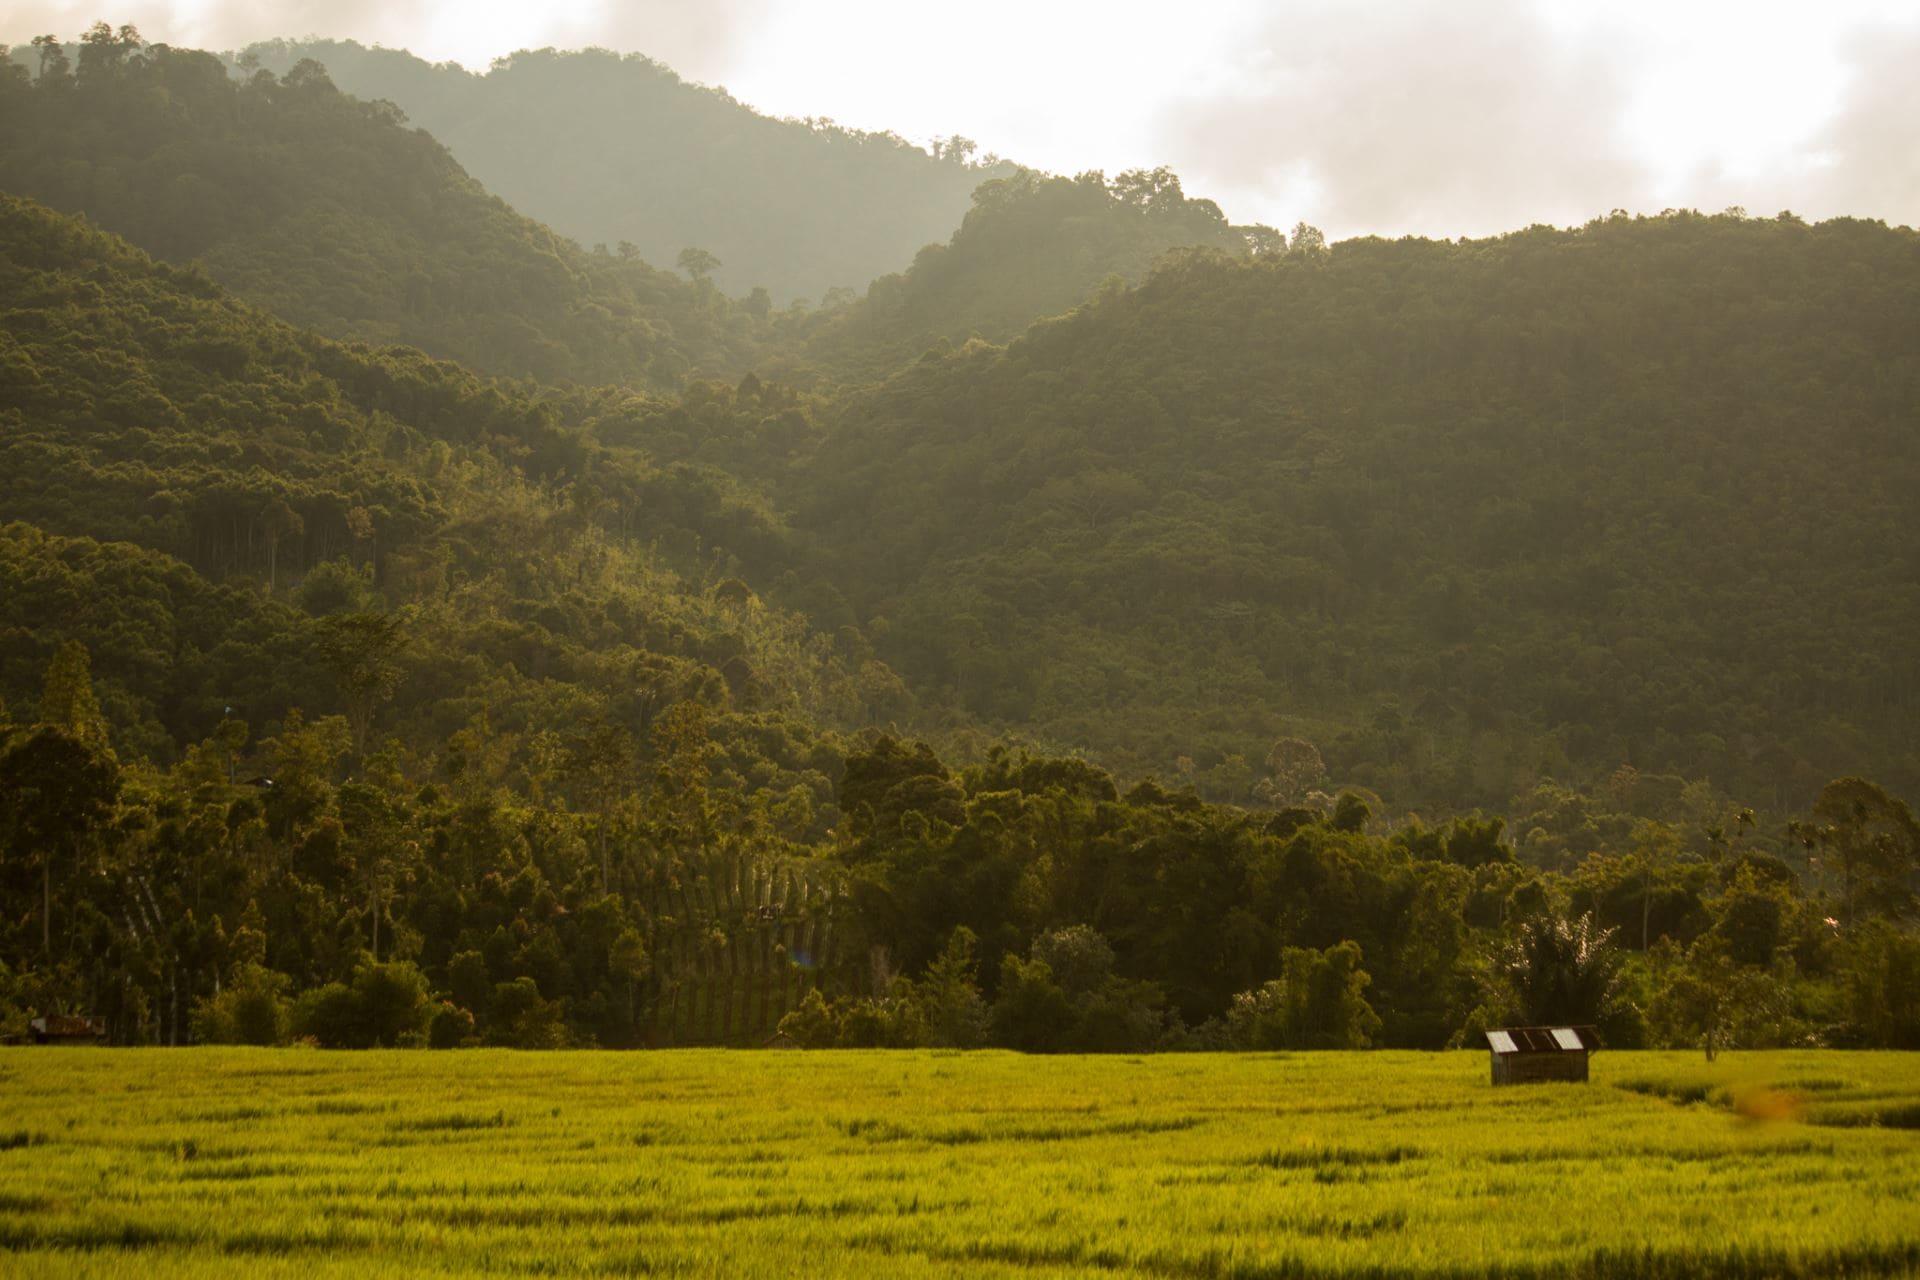 Ricefields on the edge of the rainforest, Lempur, Kerinci.